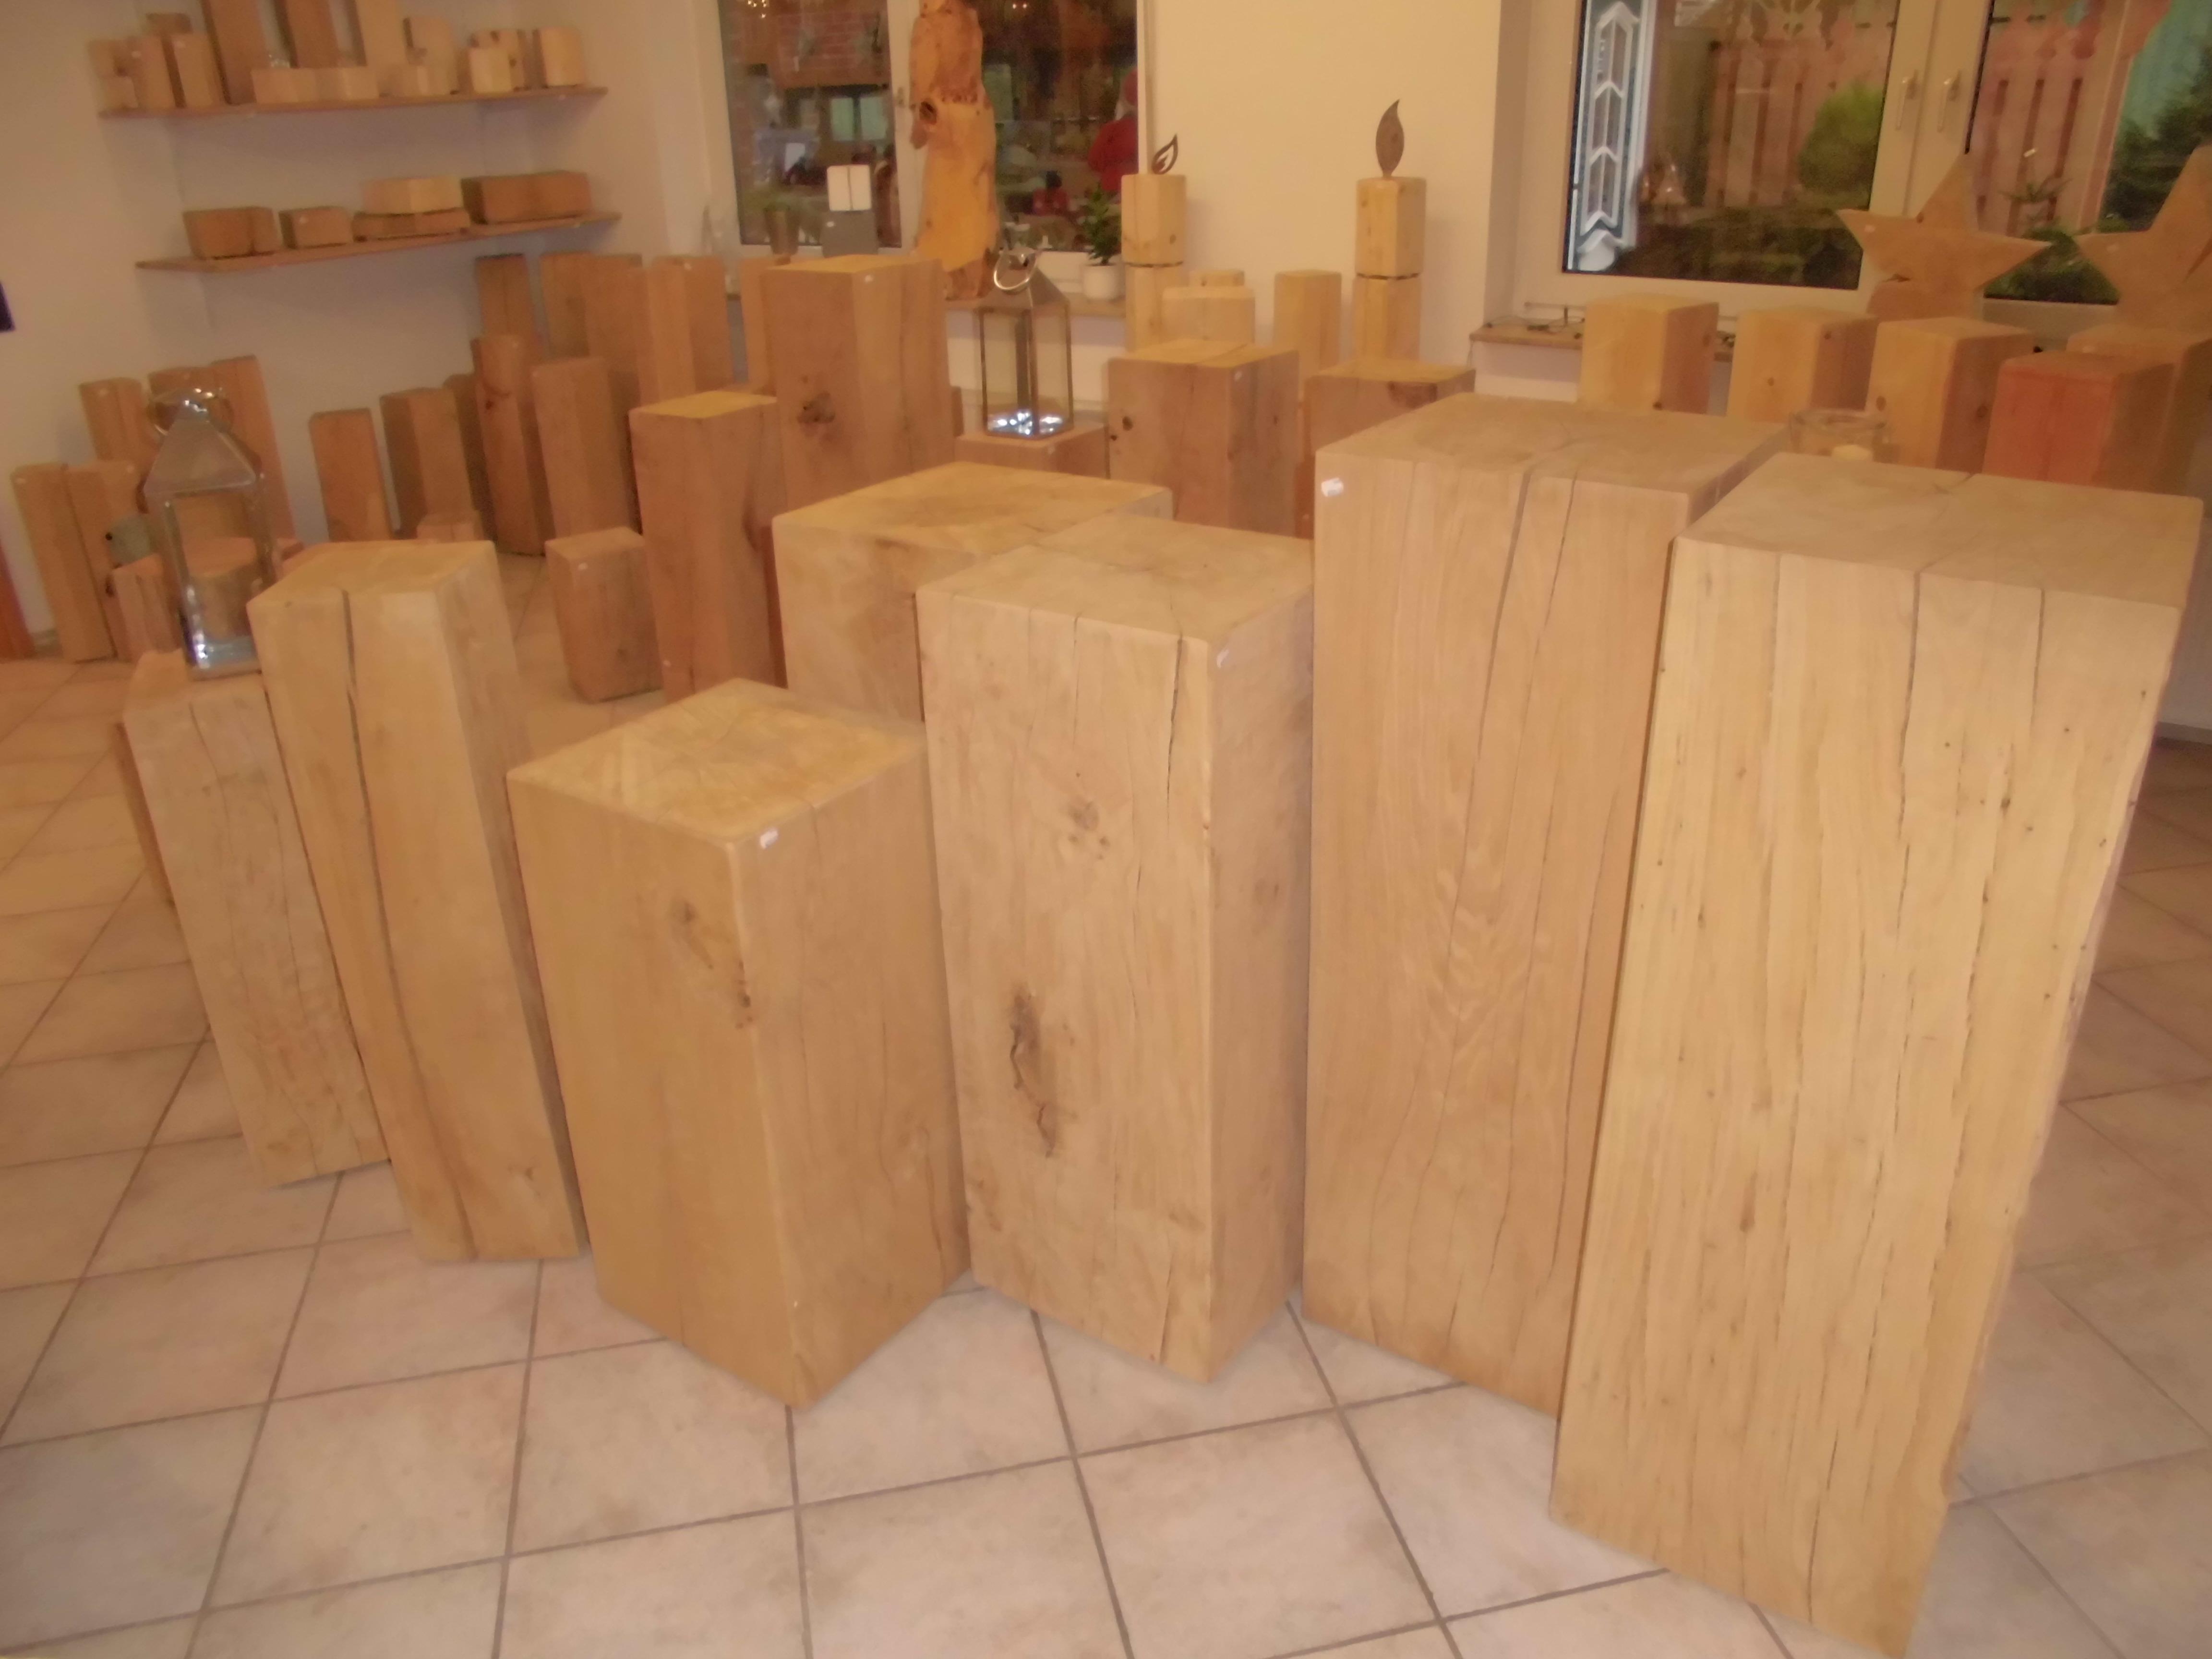 Eichenholzsäule gehobelt, geschliffen, angefast 20x20x40cm